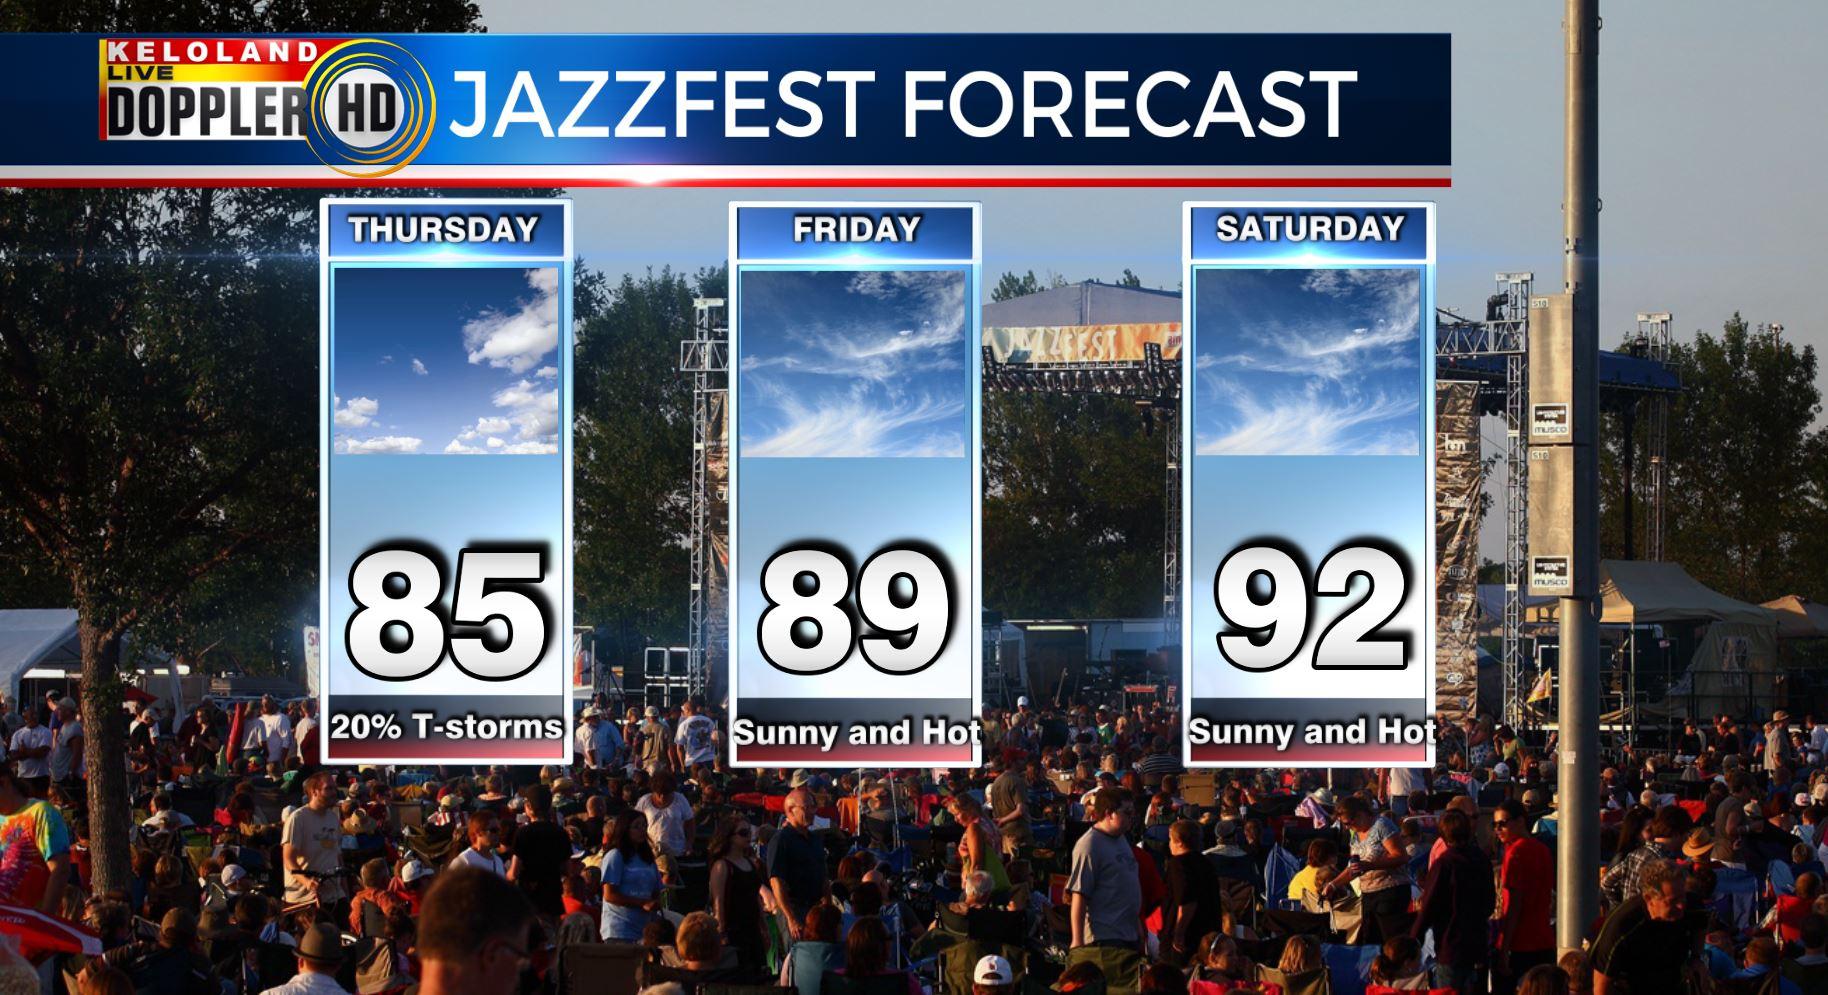 2017 JazzFest forecast